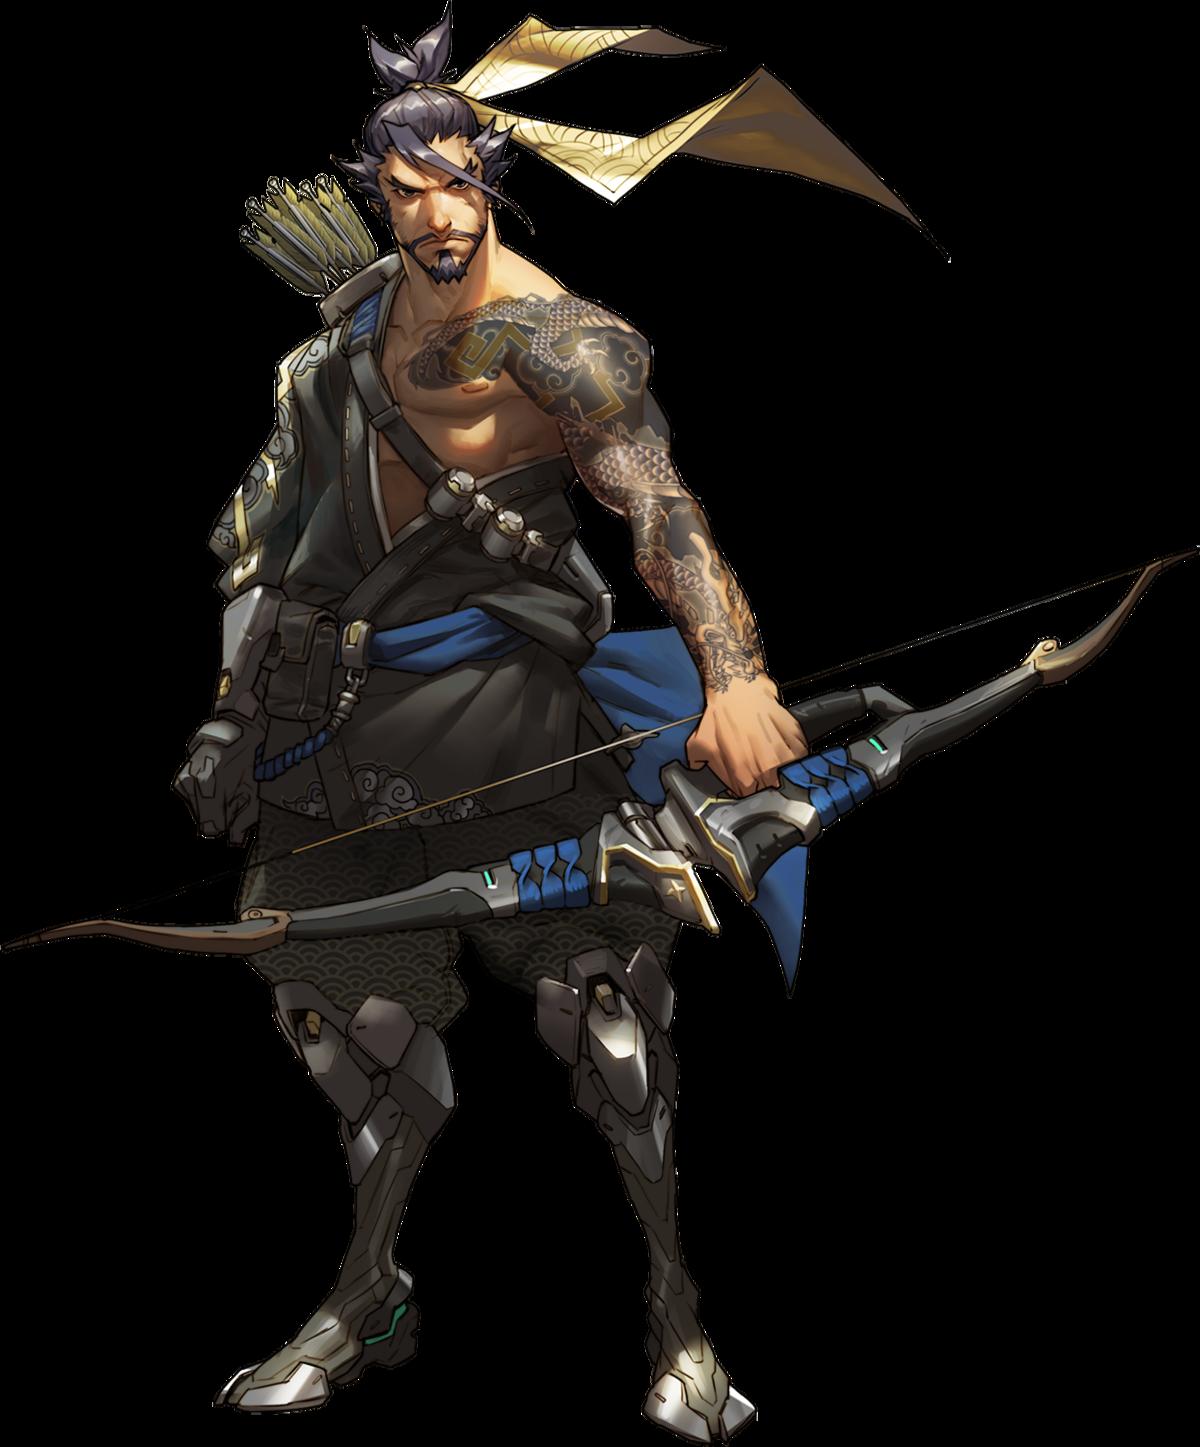 Overwatch hanzo png. Wiki